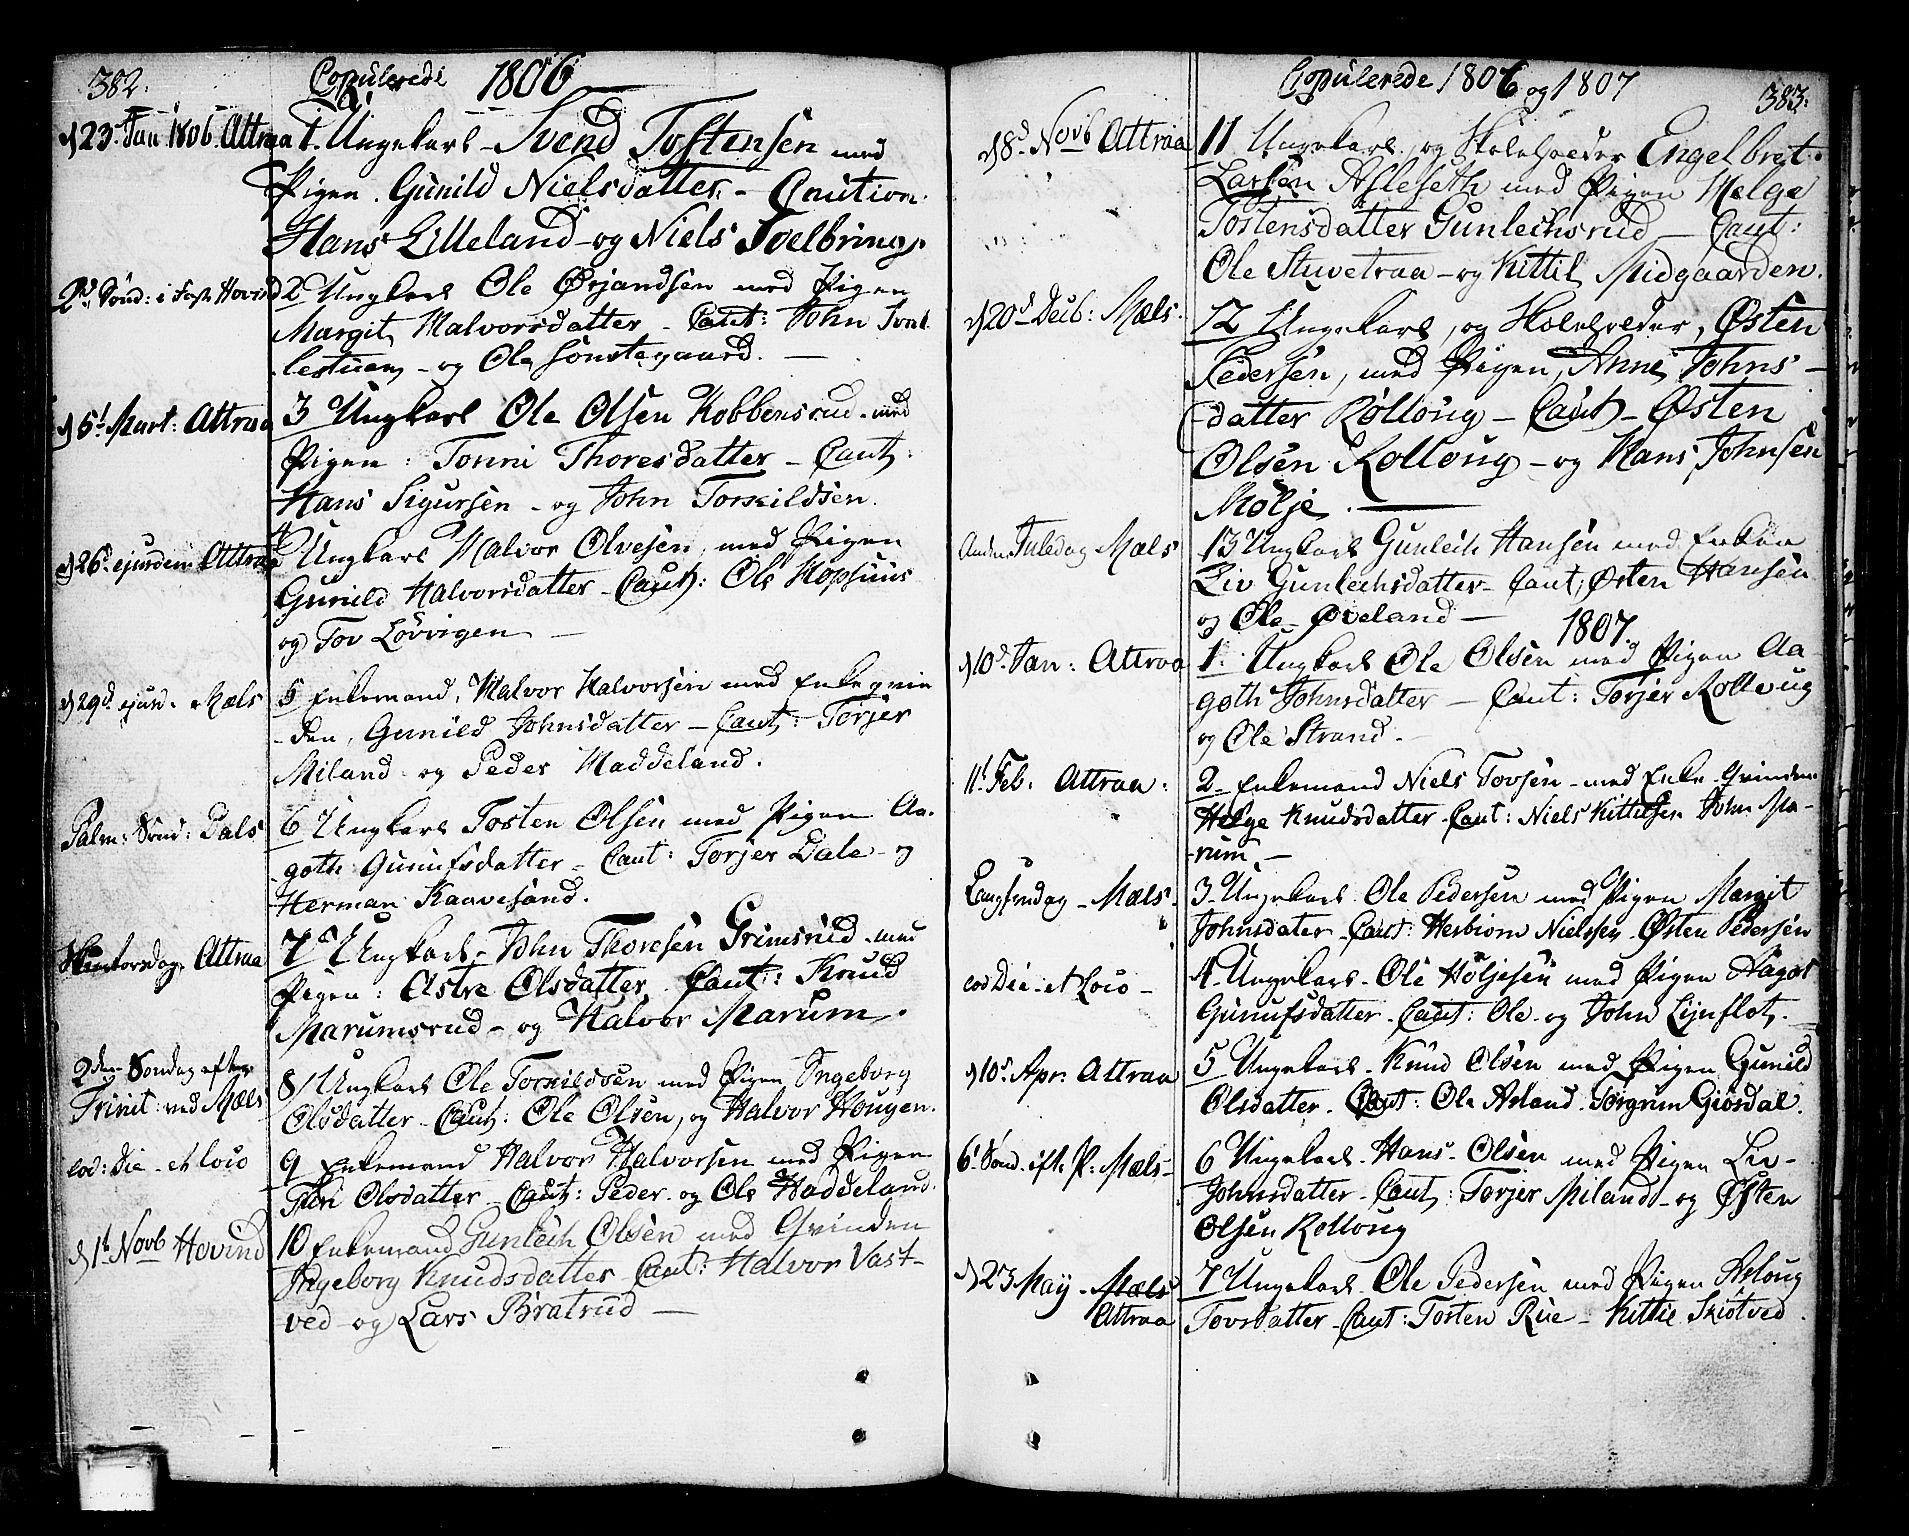 SAKO, Tinn kirkebøker, F/Fa/L0002: Ministerialbok nr. I 2, 1757-1810, s. 382-383